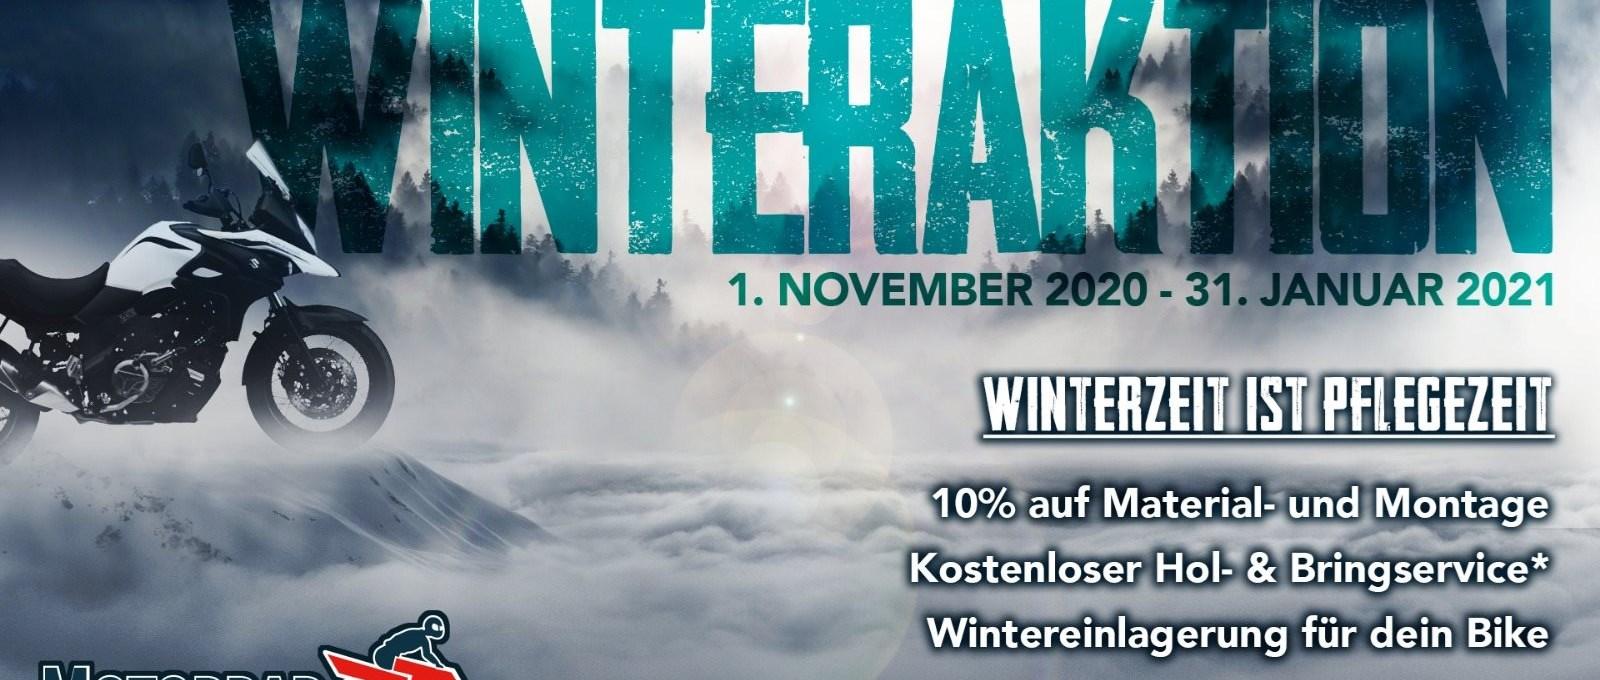 Winteraktion 2020/2021